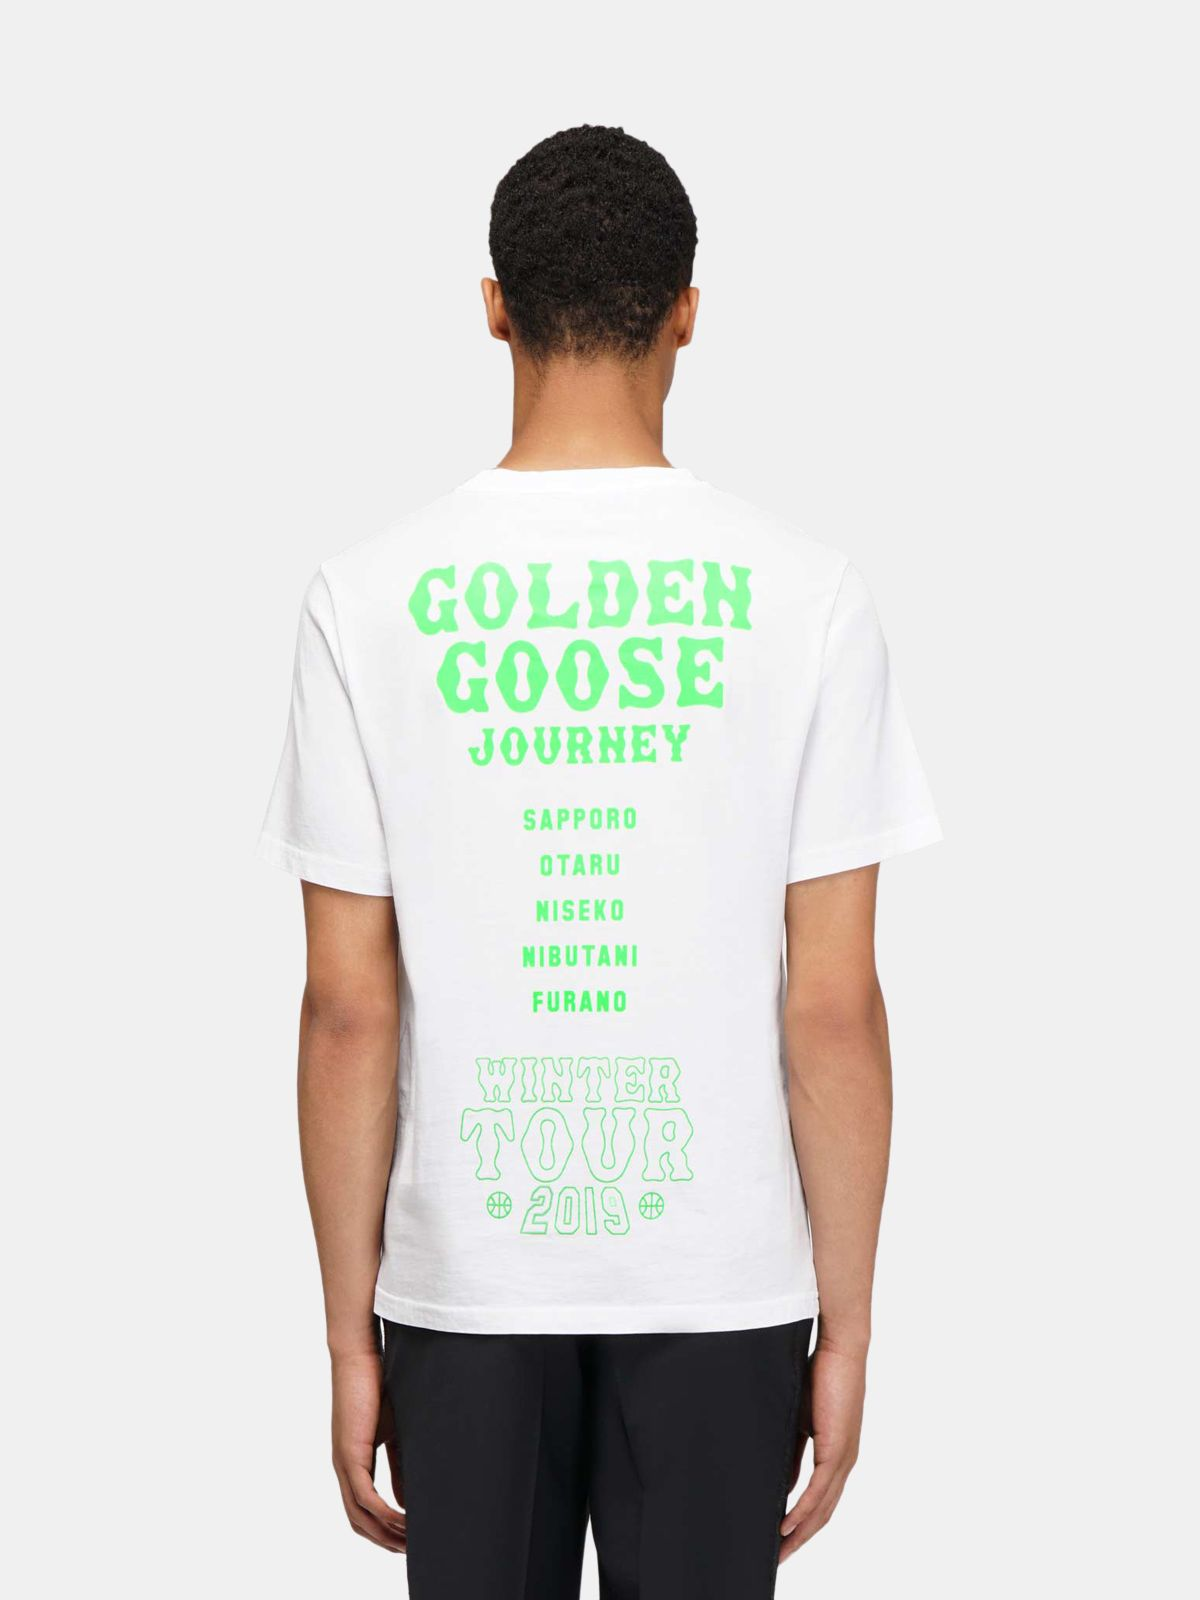 Golden Goose - T-shirt Hokkaido Travel Guide in